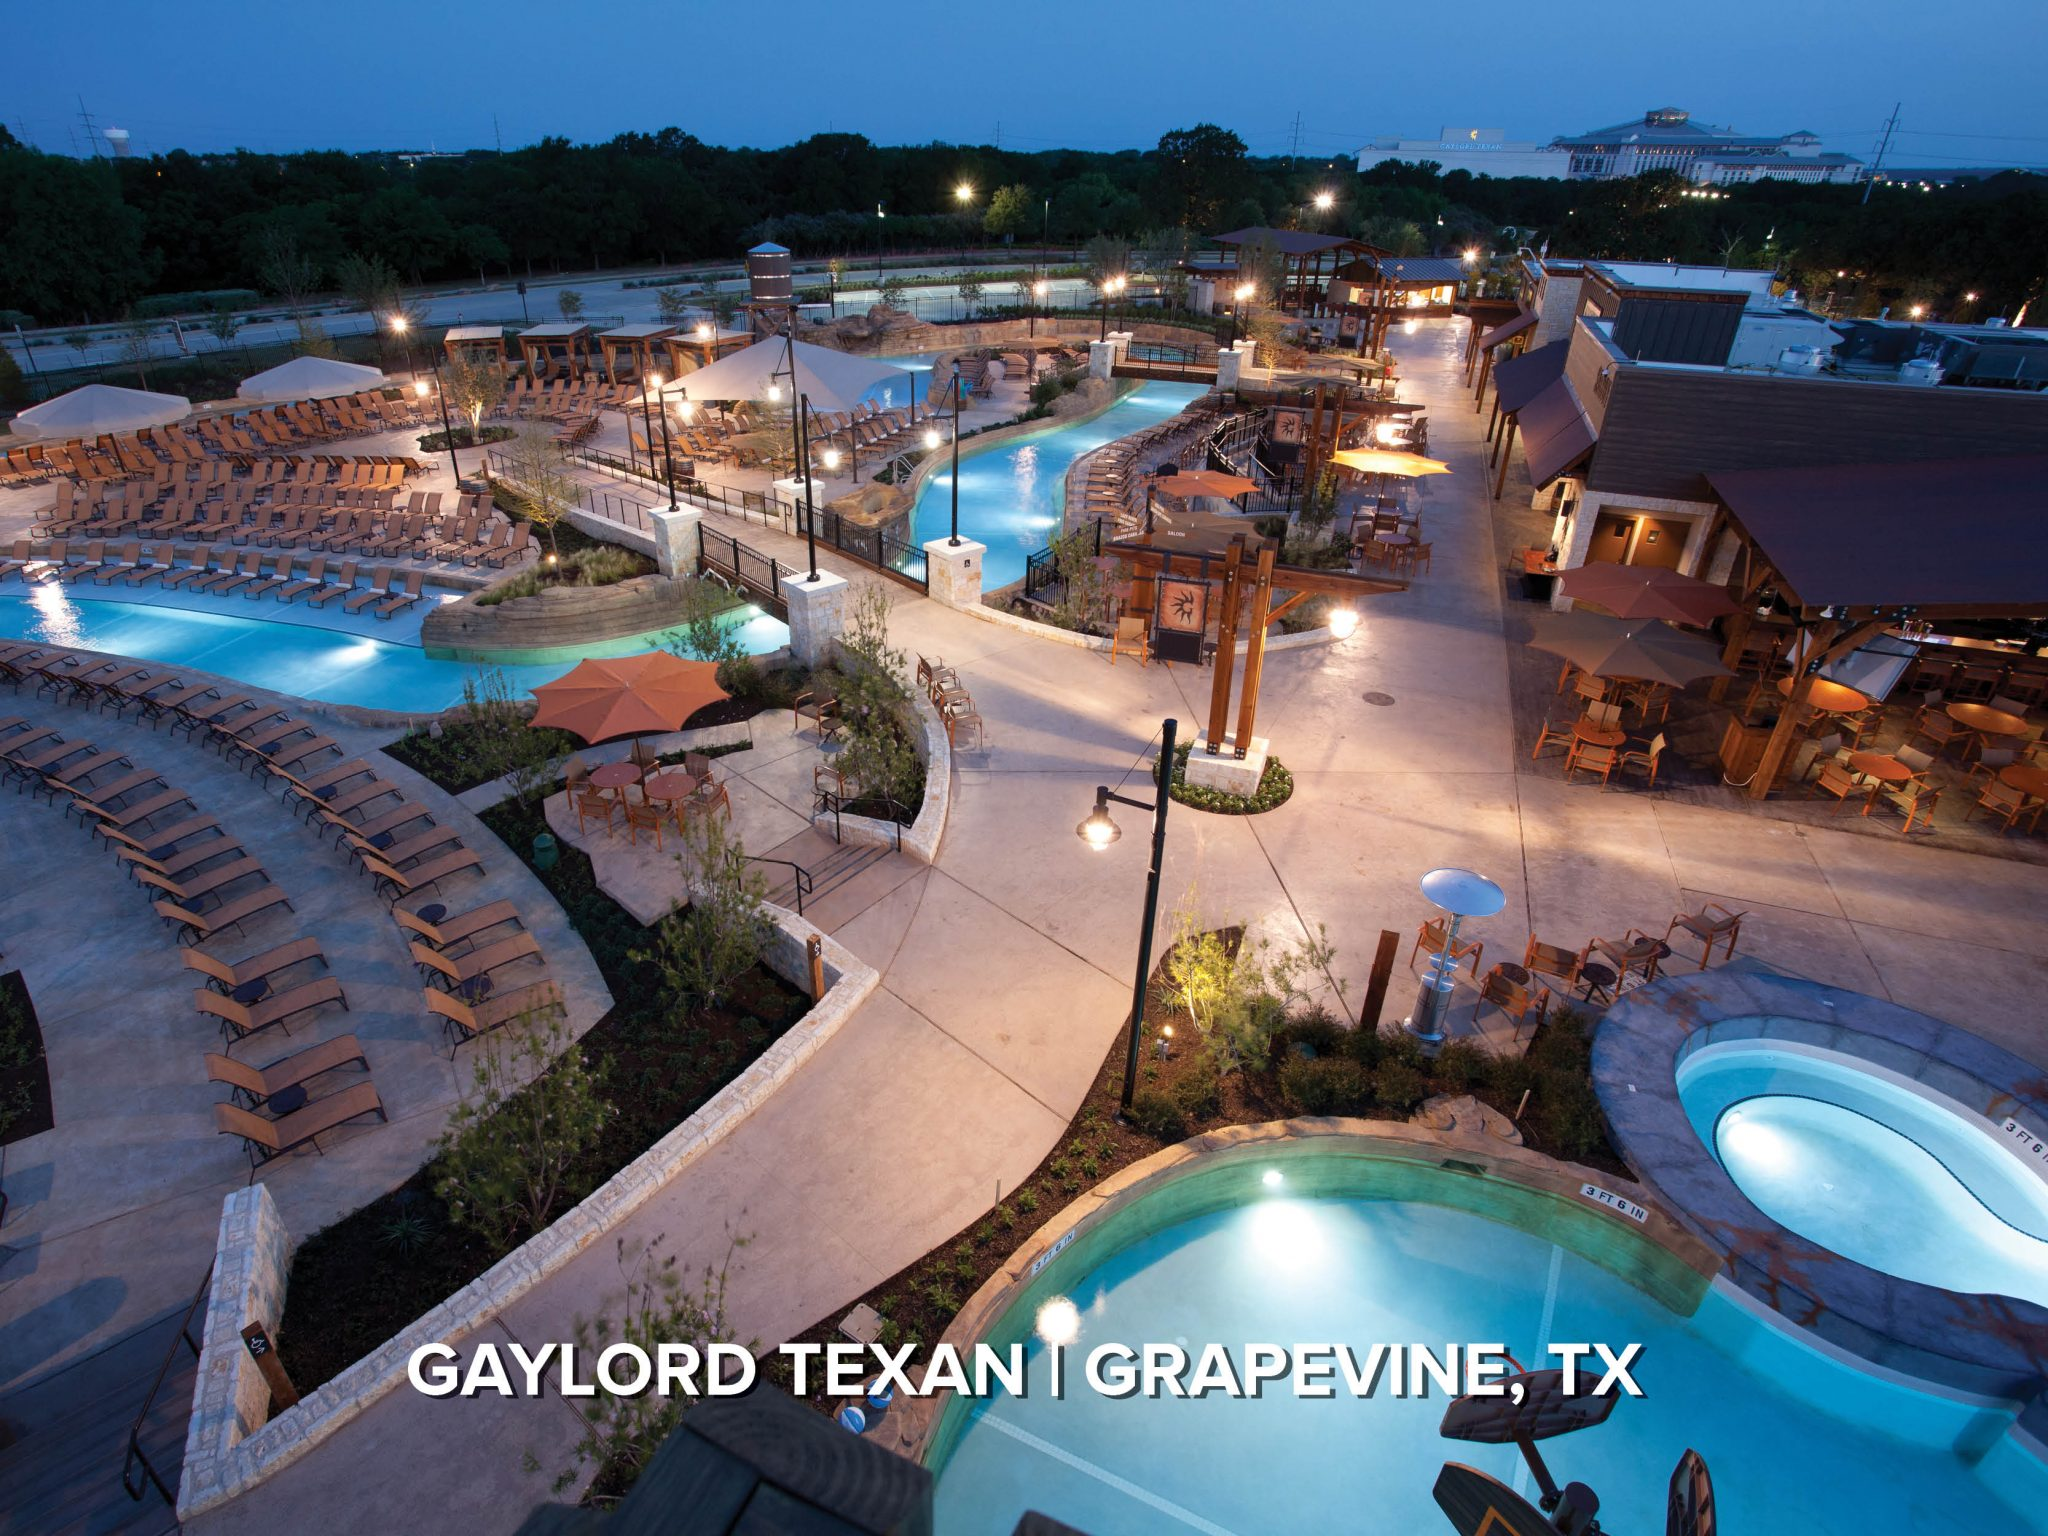 Gaylord Texan